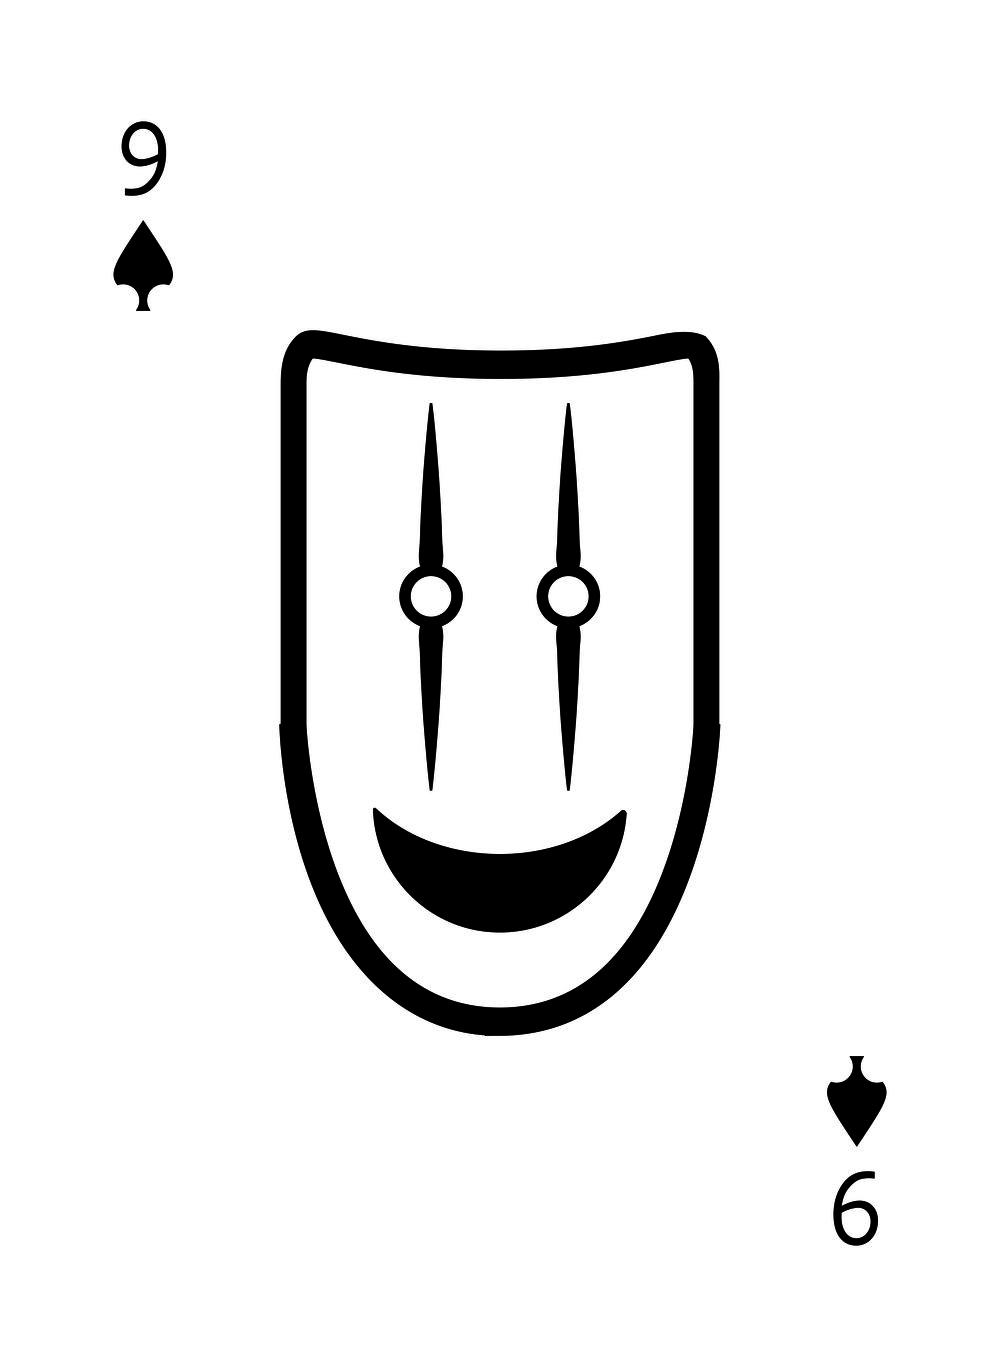 52_2__0004_Spades_9.jpg